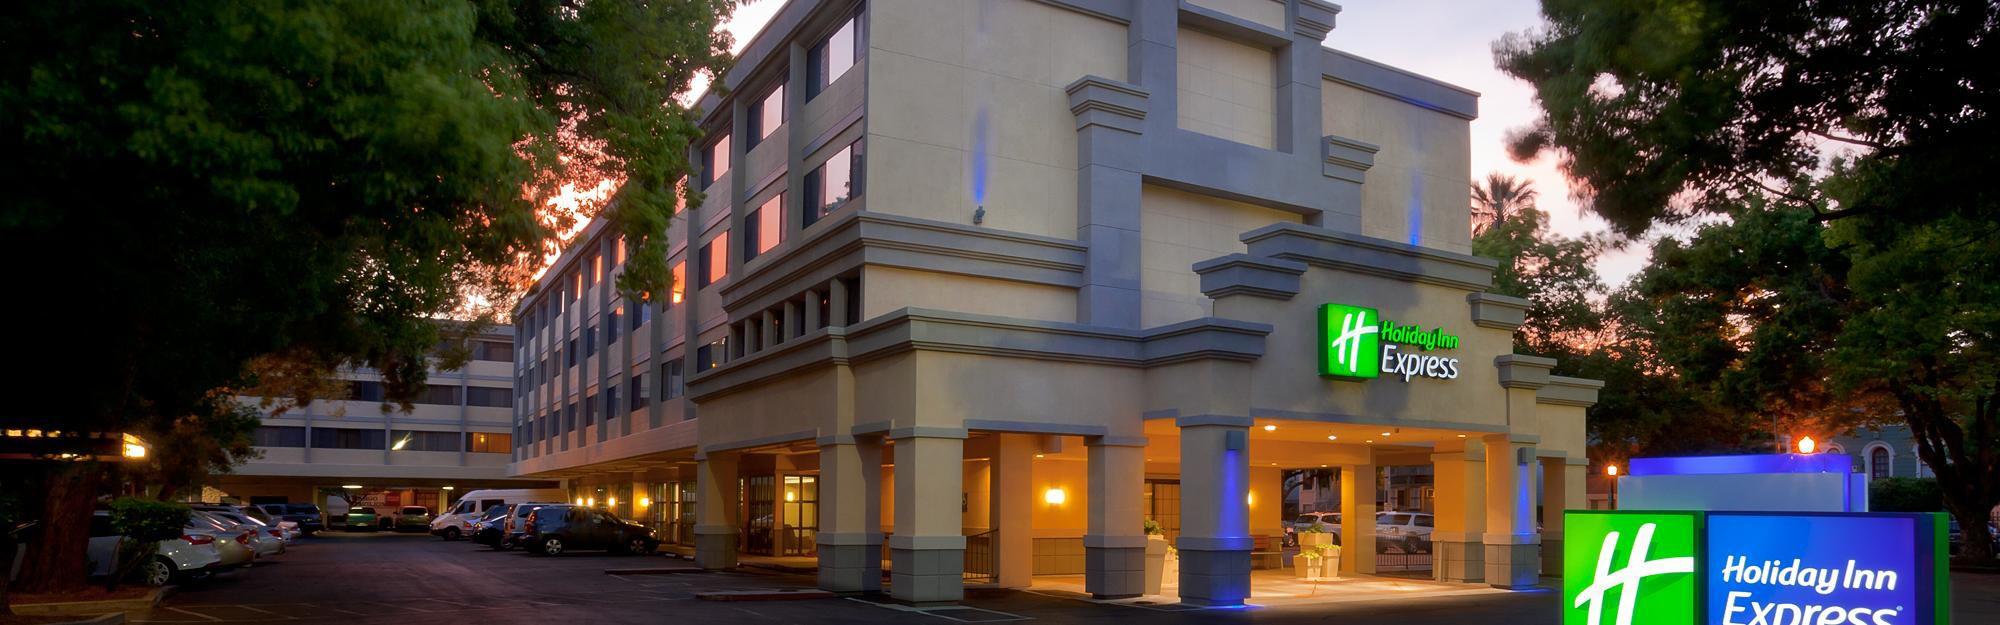 Holiday Inn Express Sacramento Convention Center image 0